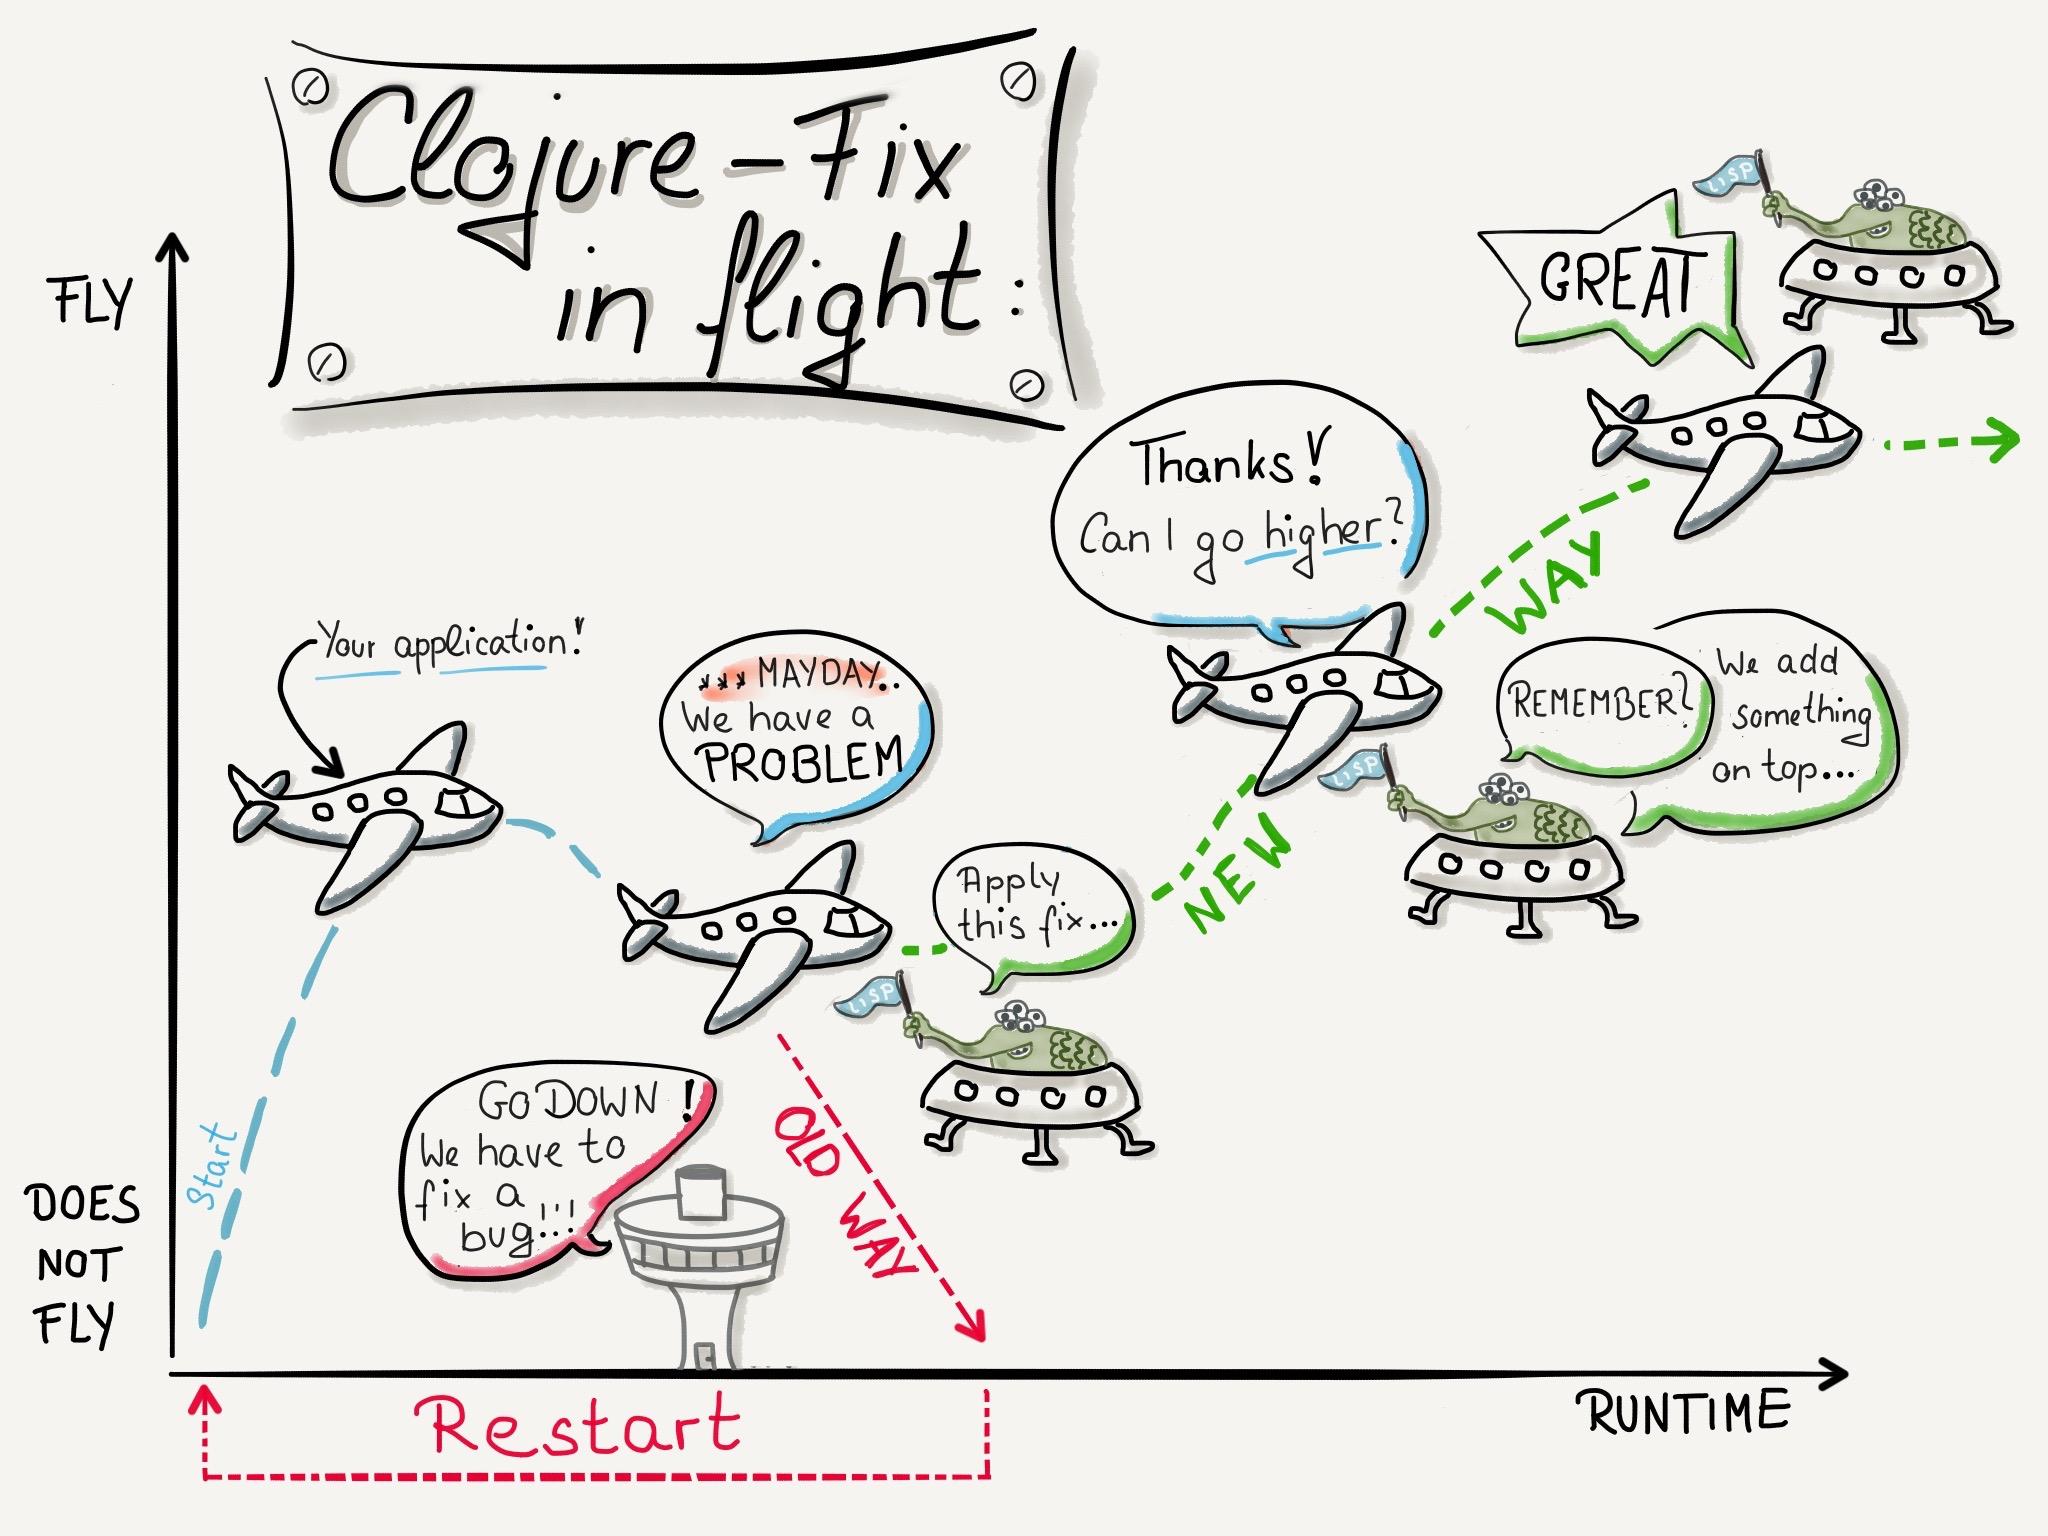 Clojure and LISP - Fix and flight